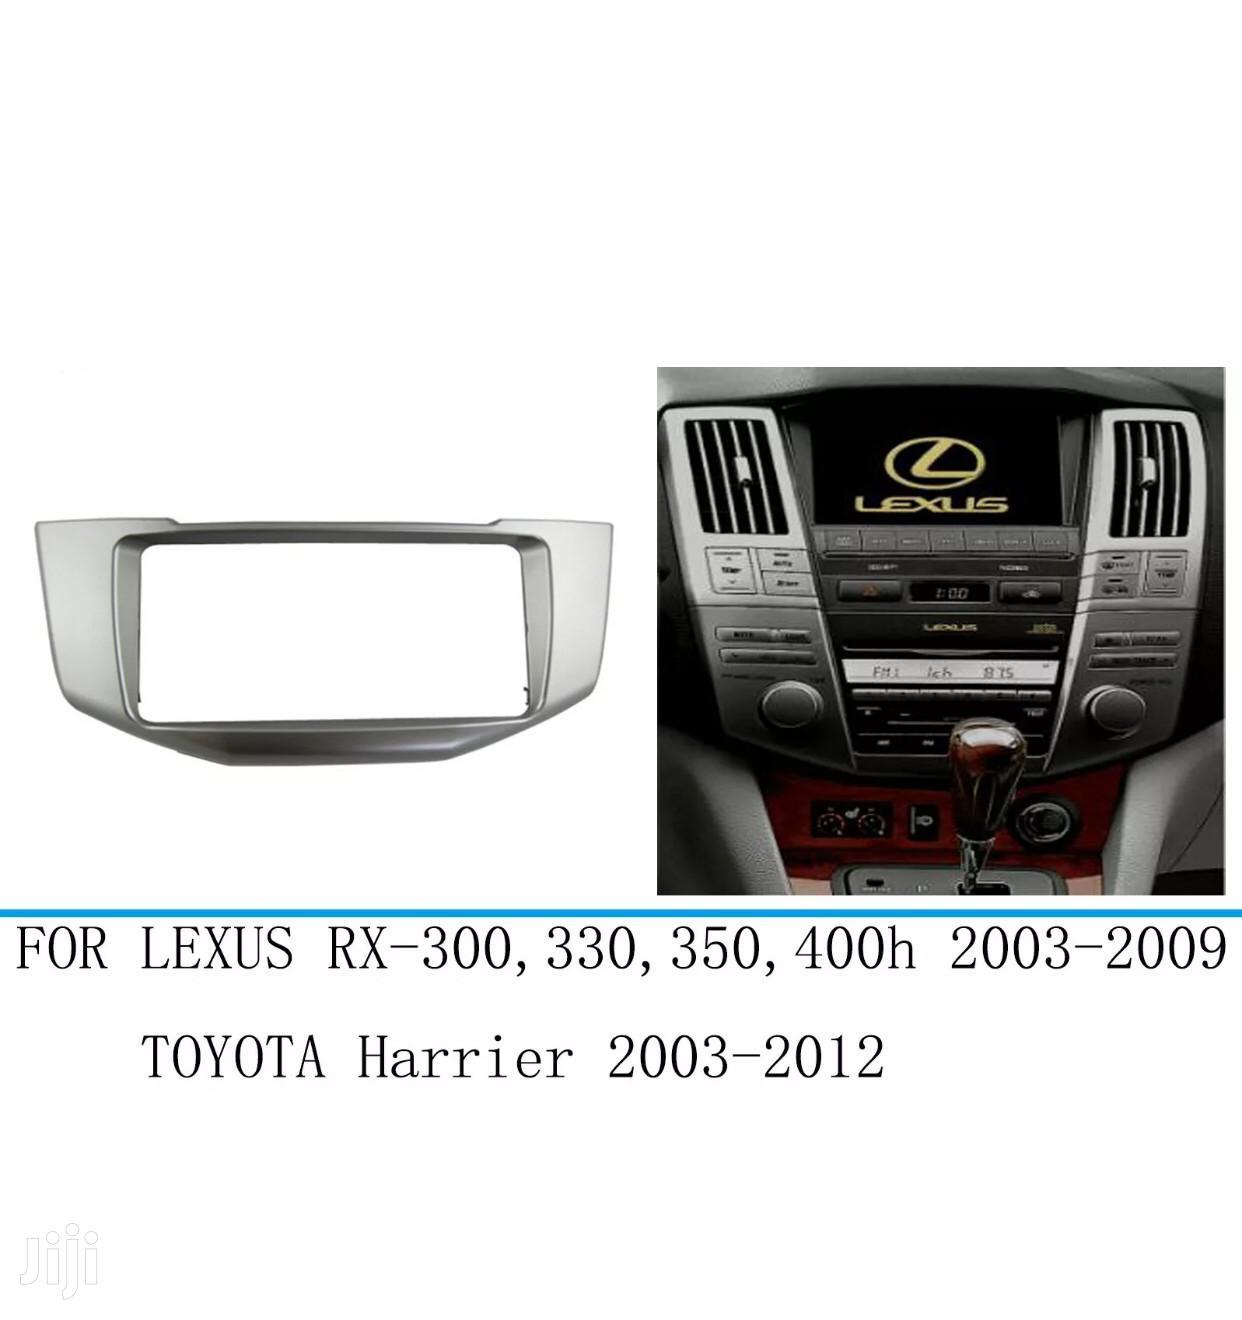 Toyota Harrier Stereo Radio Fascia Dash Box